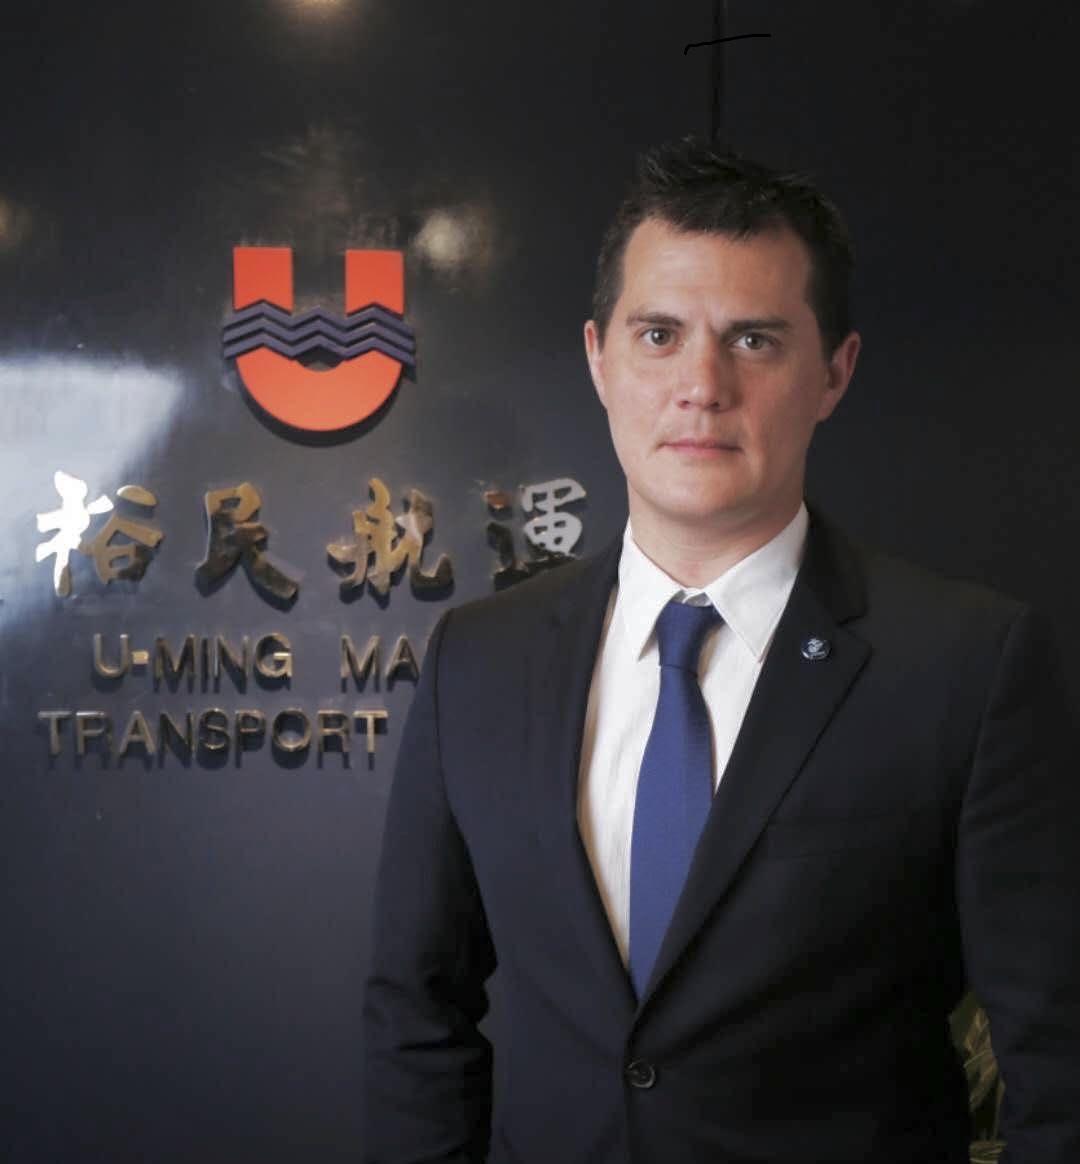 U-Ming Jeff Hsu